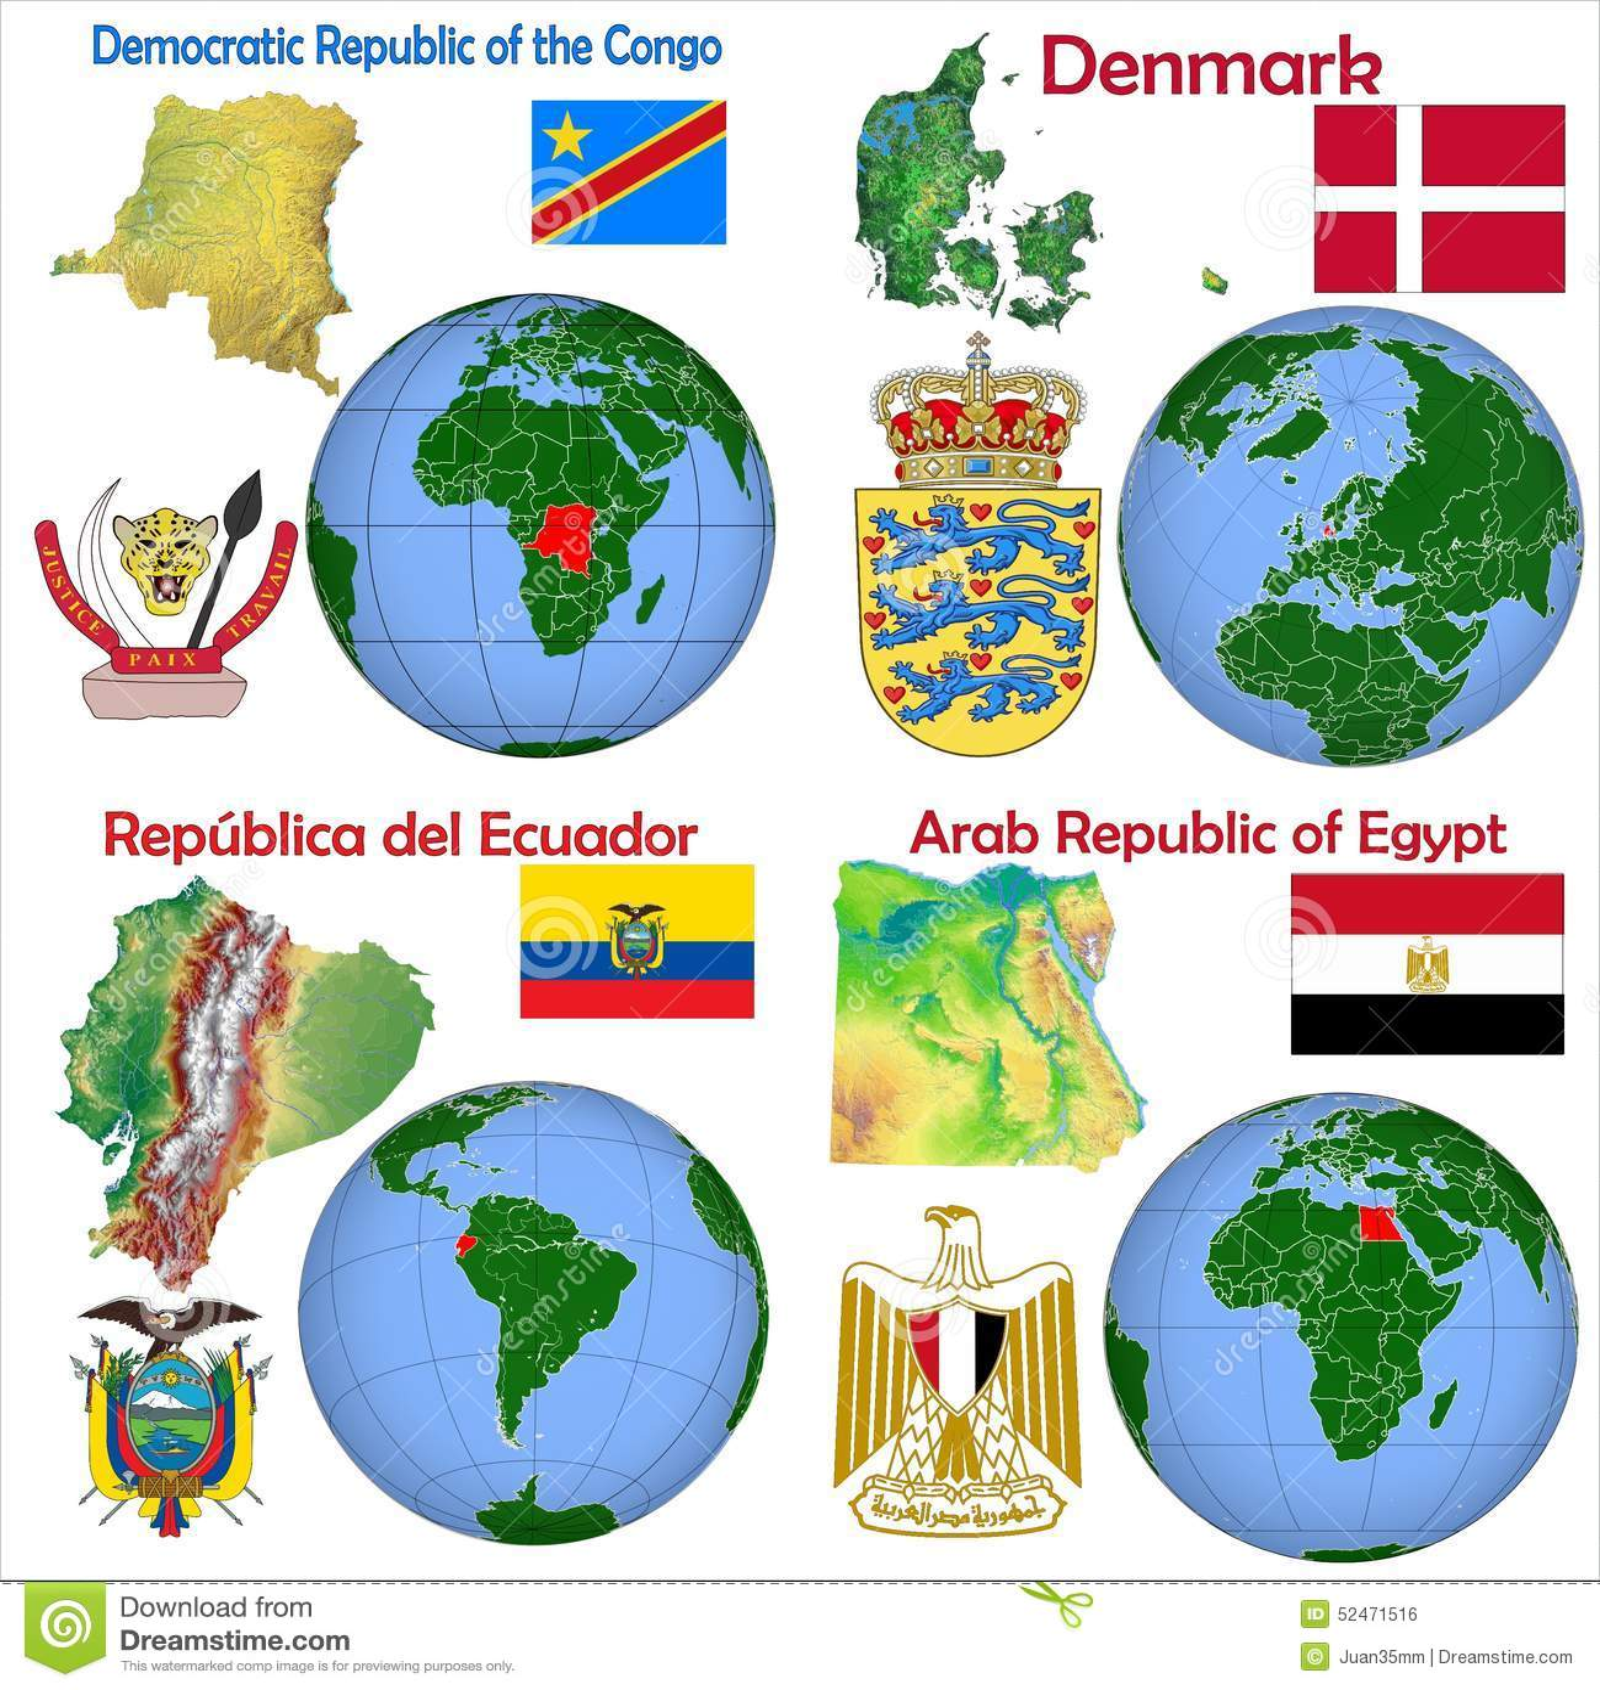 demokratisk republik